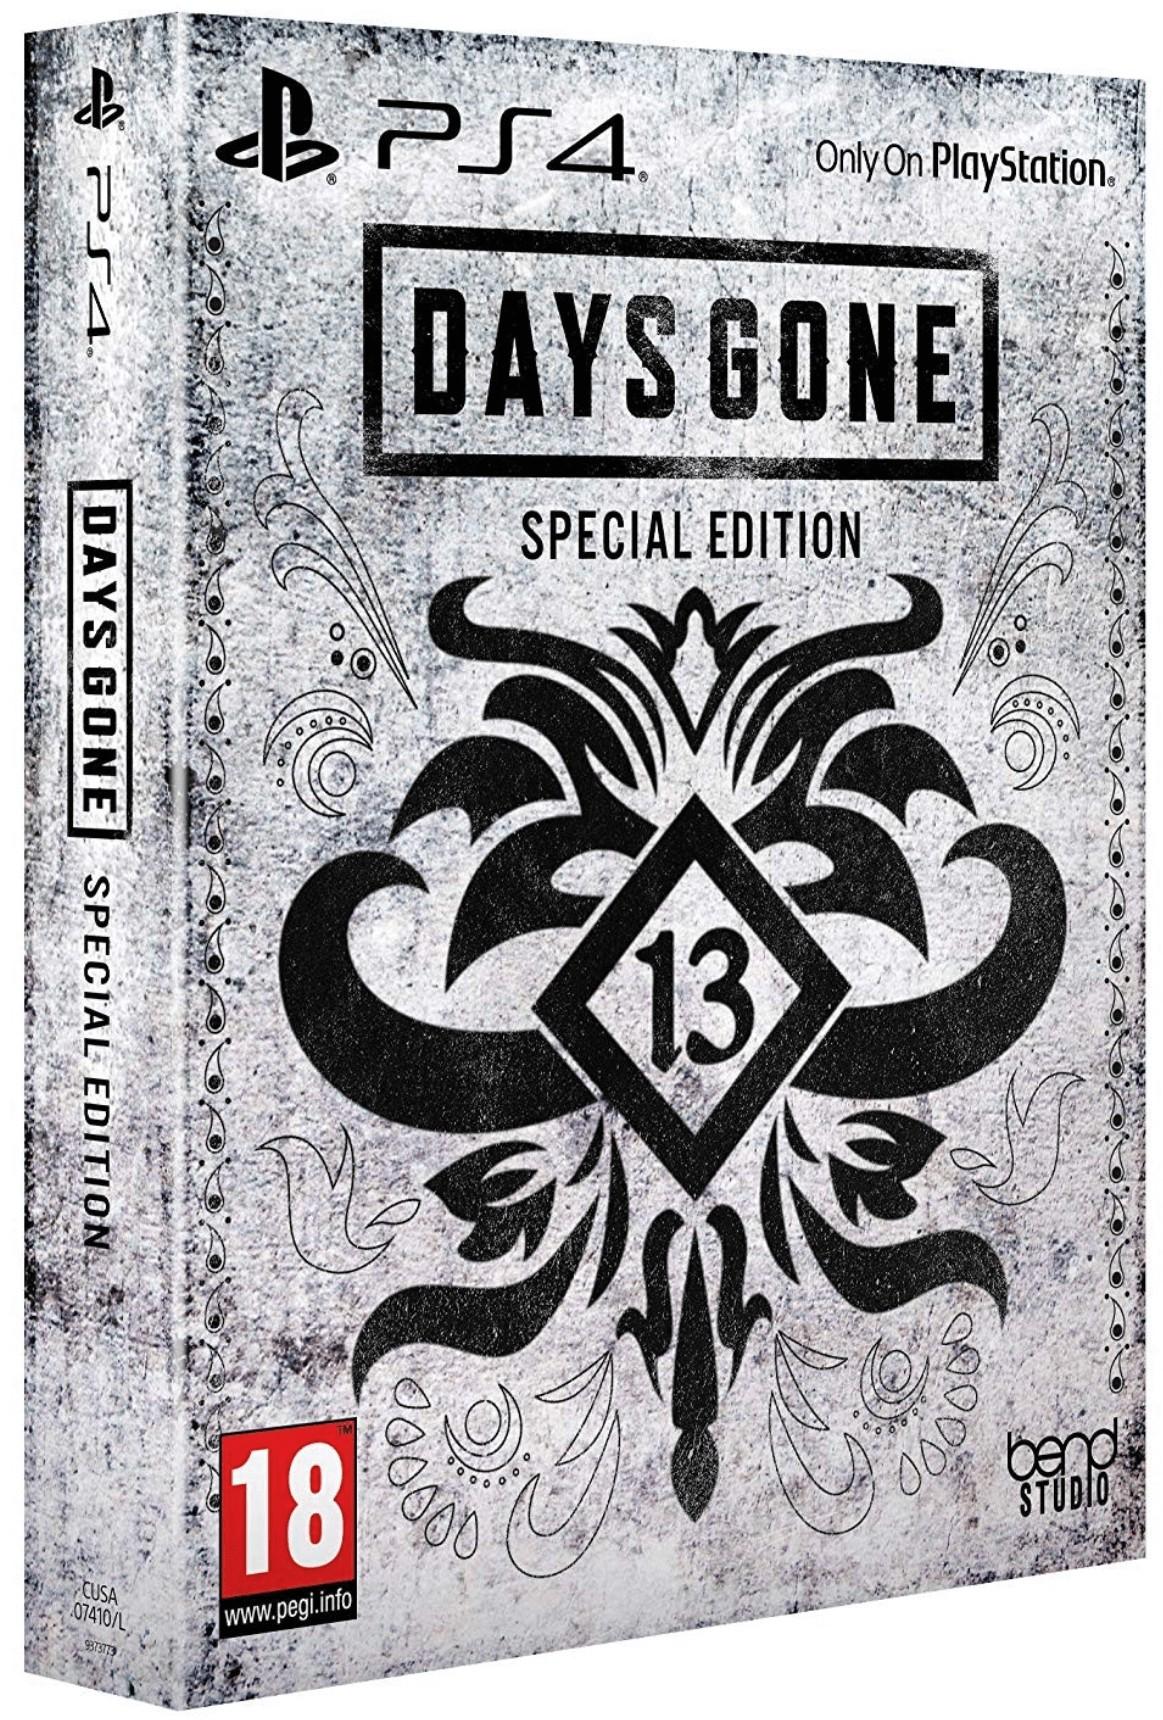 Days Gone Special Edition + Preorder bonus PS4